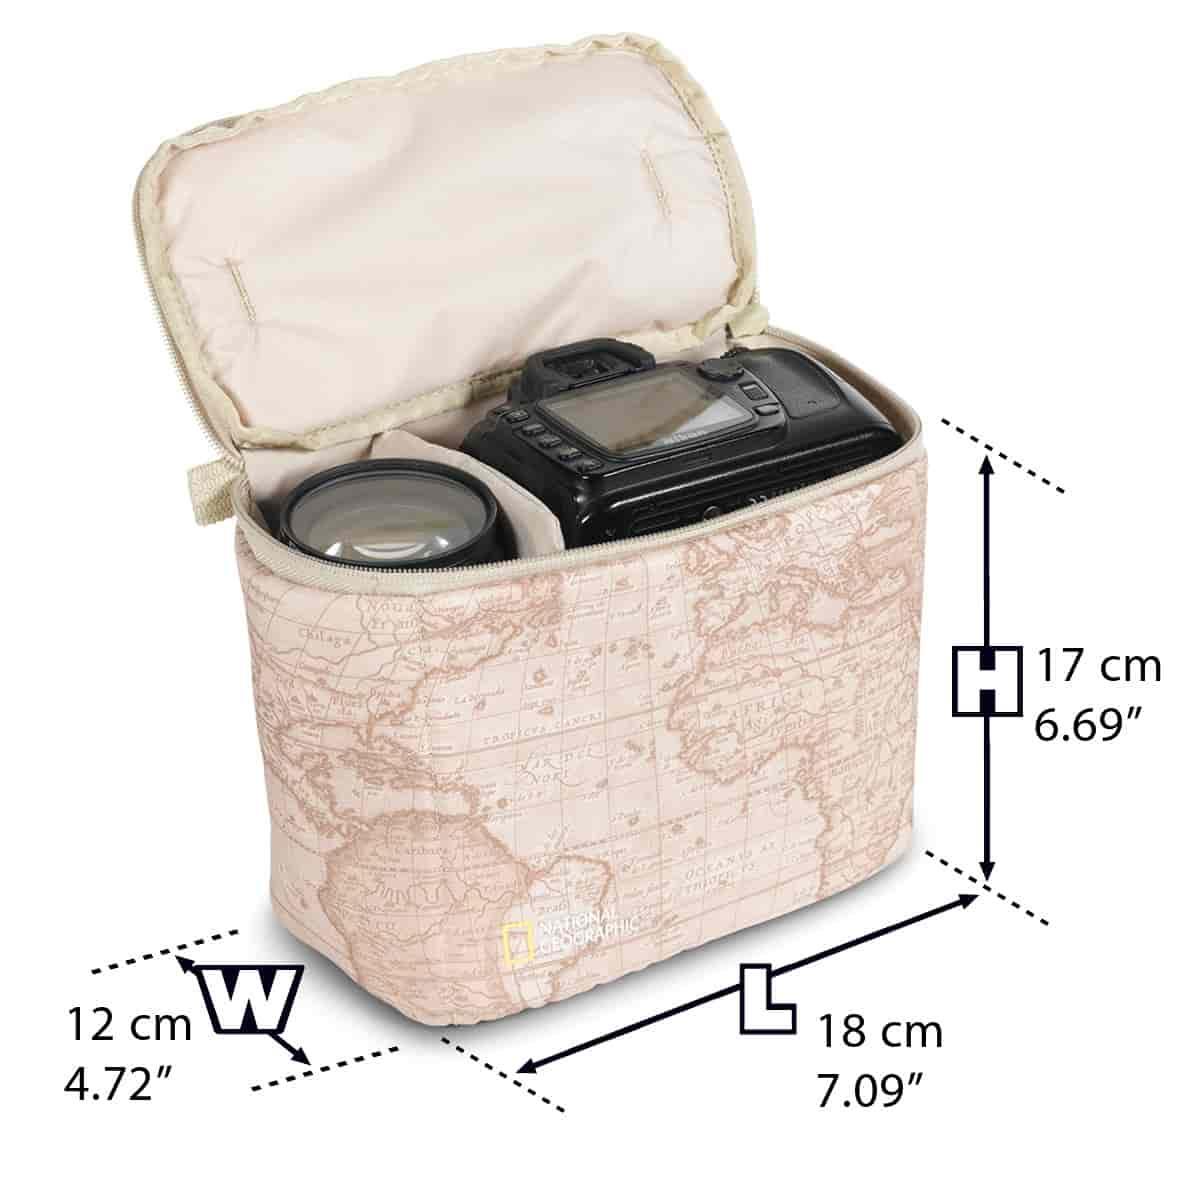 Buy National Geographic Camera Shoulder Bag Ng 2346 Features Tas Kamera Messenger Honx 008 Khaki